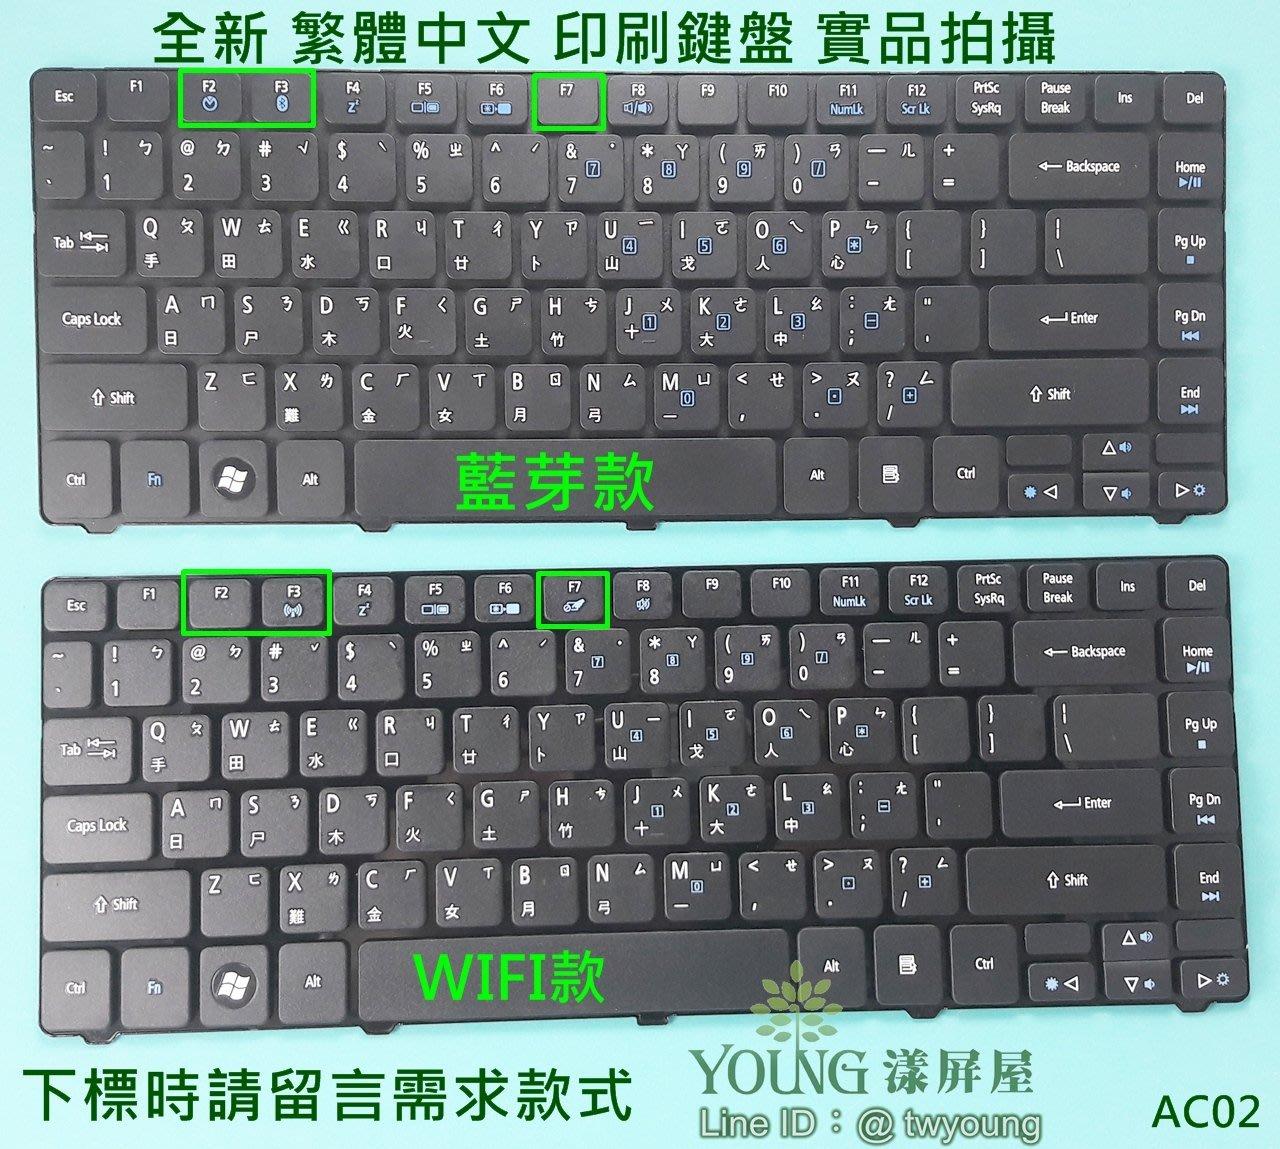 【漾屏屋】宏碁 ACER Aspire 4810 4810TG 4810T 4810TZ 4810TZG 筆電 鍵盤